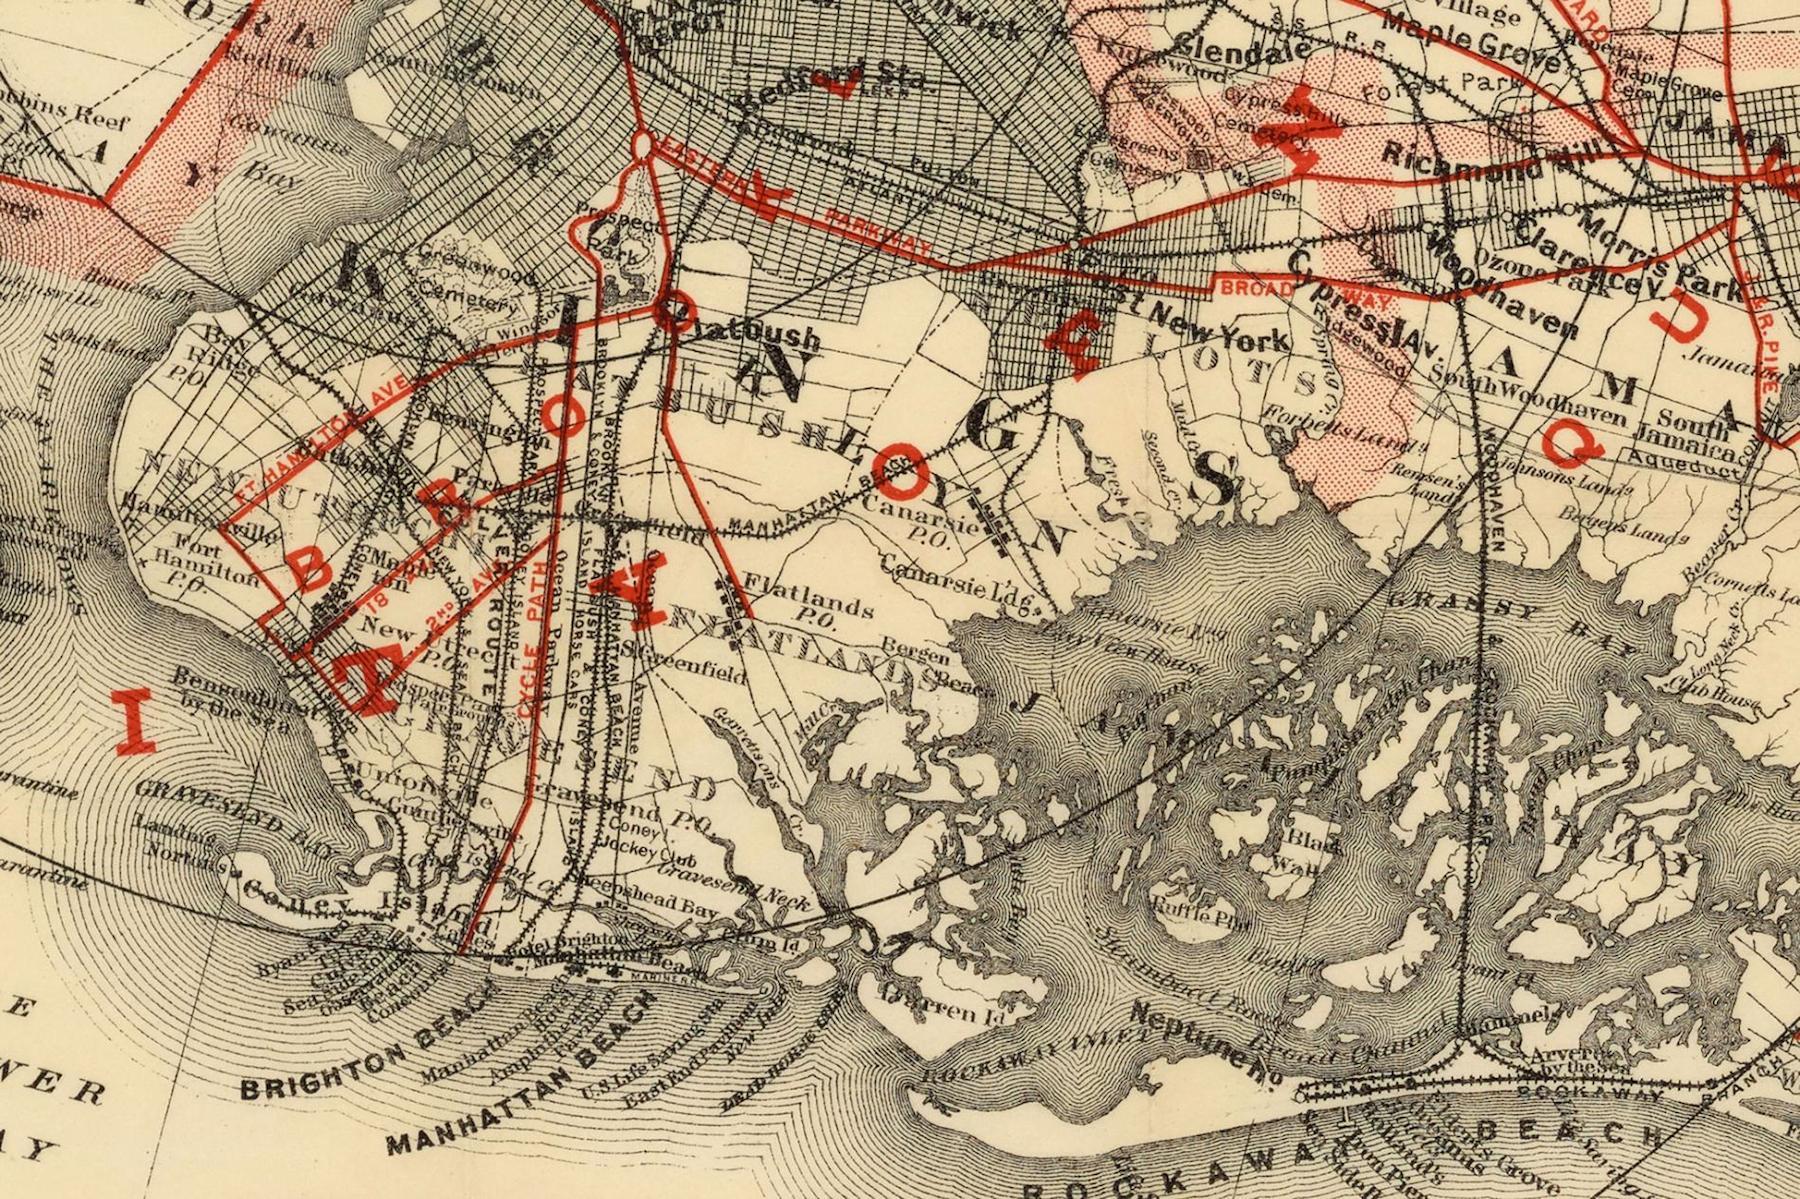 1897 LAW map.jpg